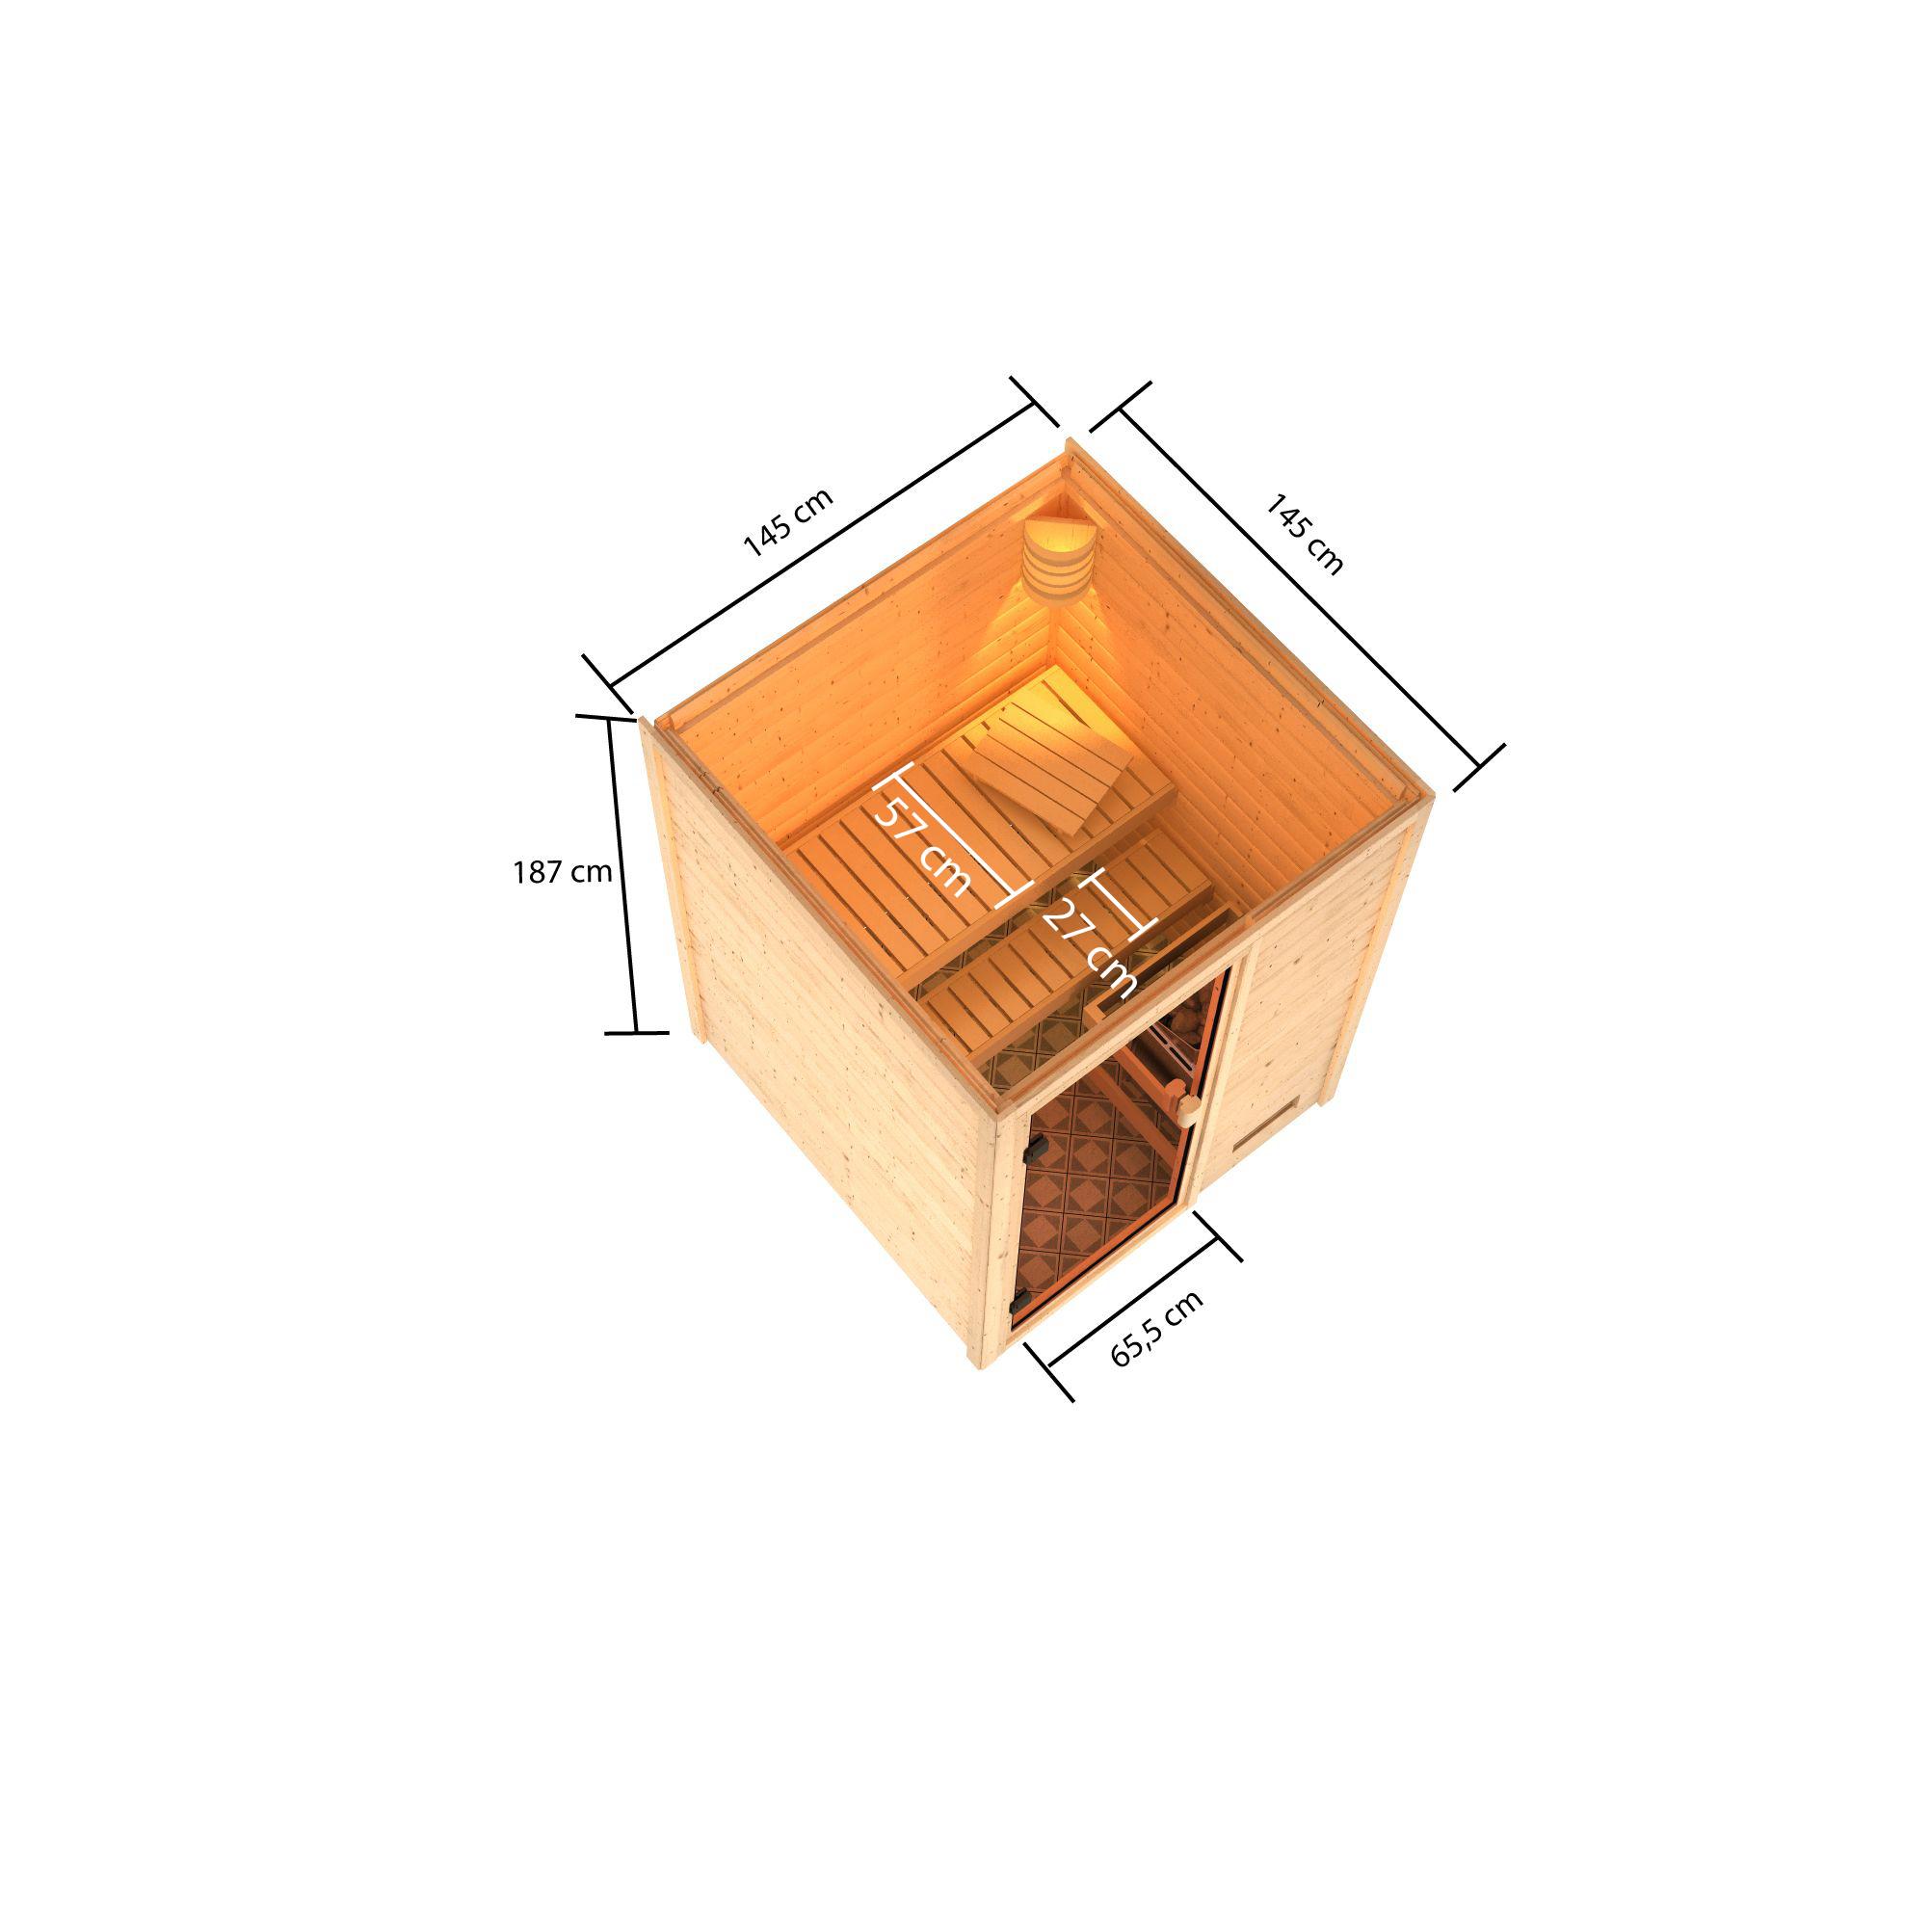 Woodfeeling Sauna Sandra 38mm 230V Saunaofen 3,6 kW intern Bild 5